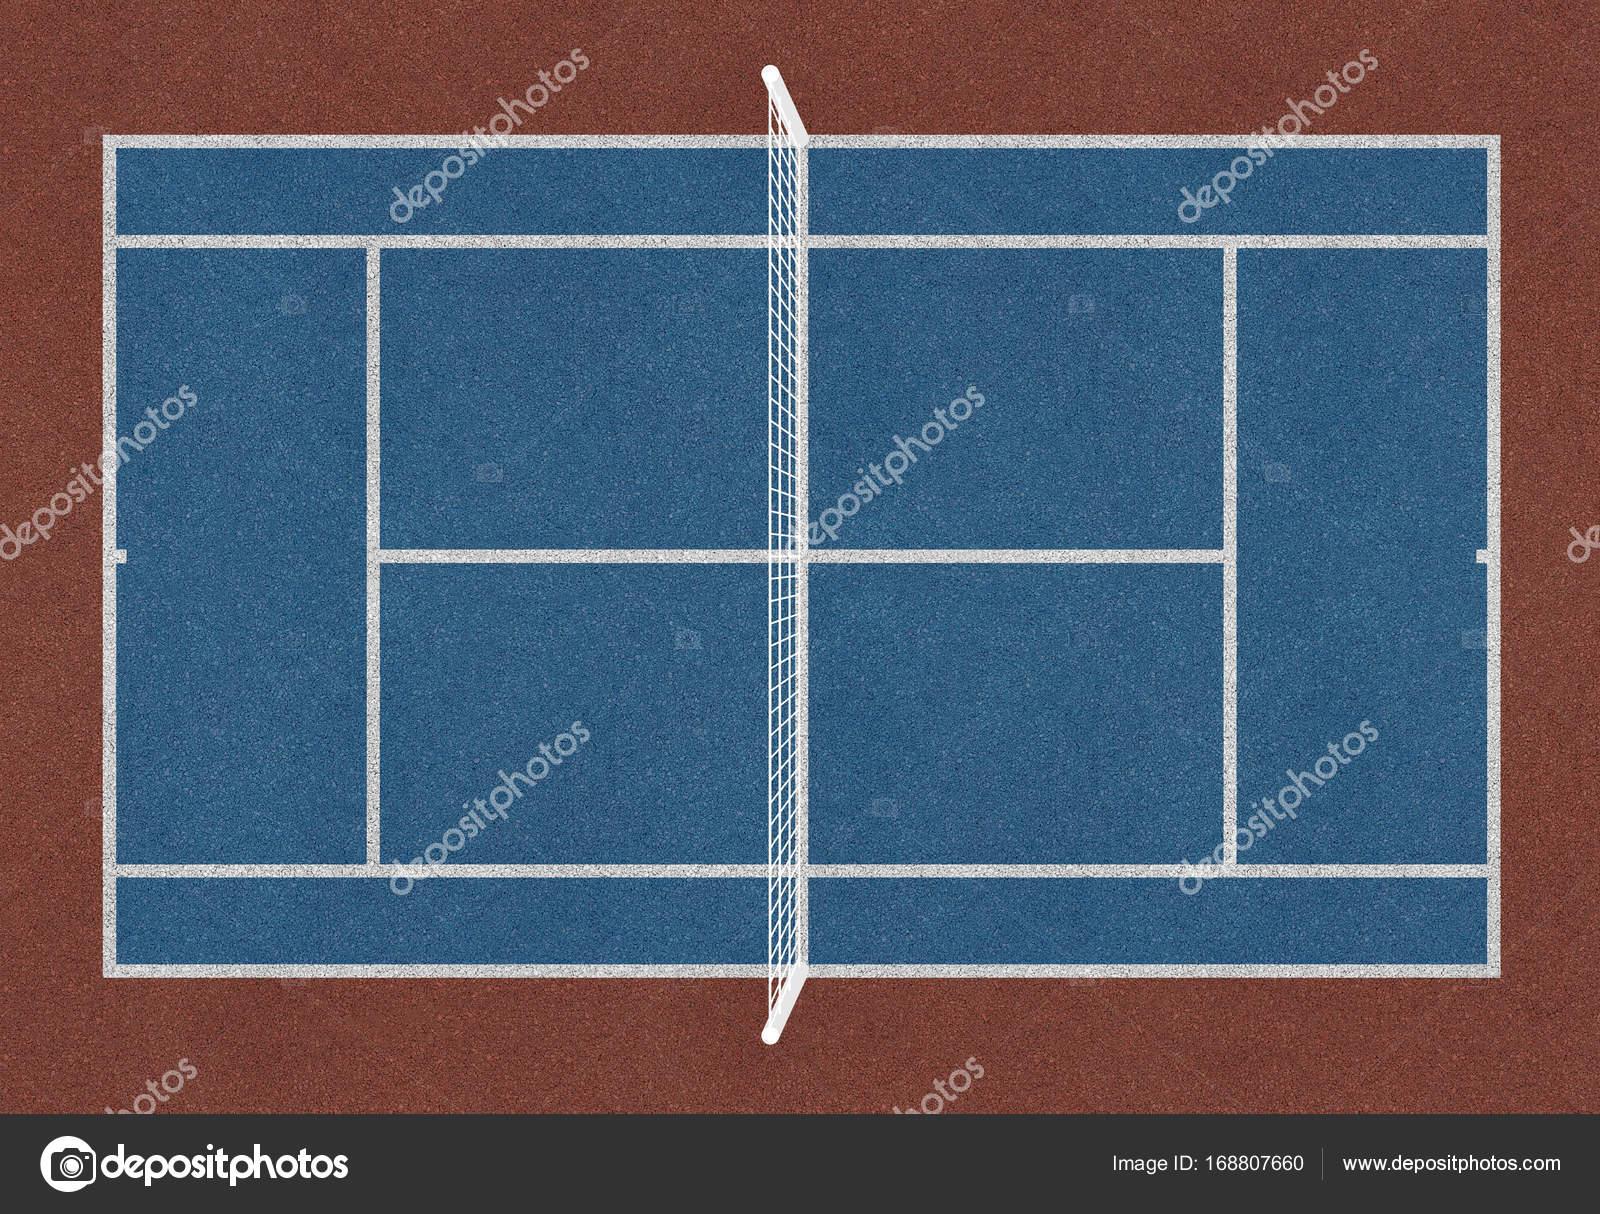 Terrain de tennis  Court de tennis bleu — Photographie